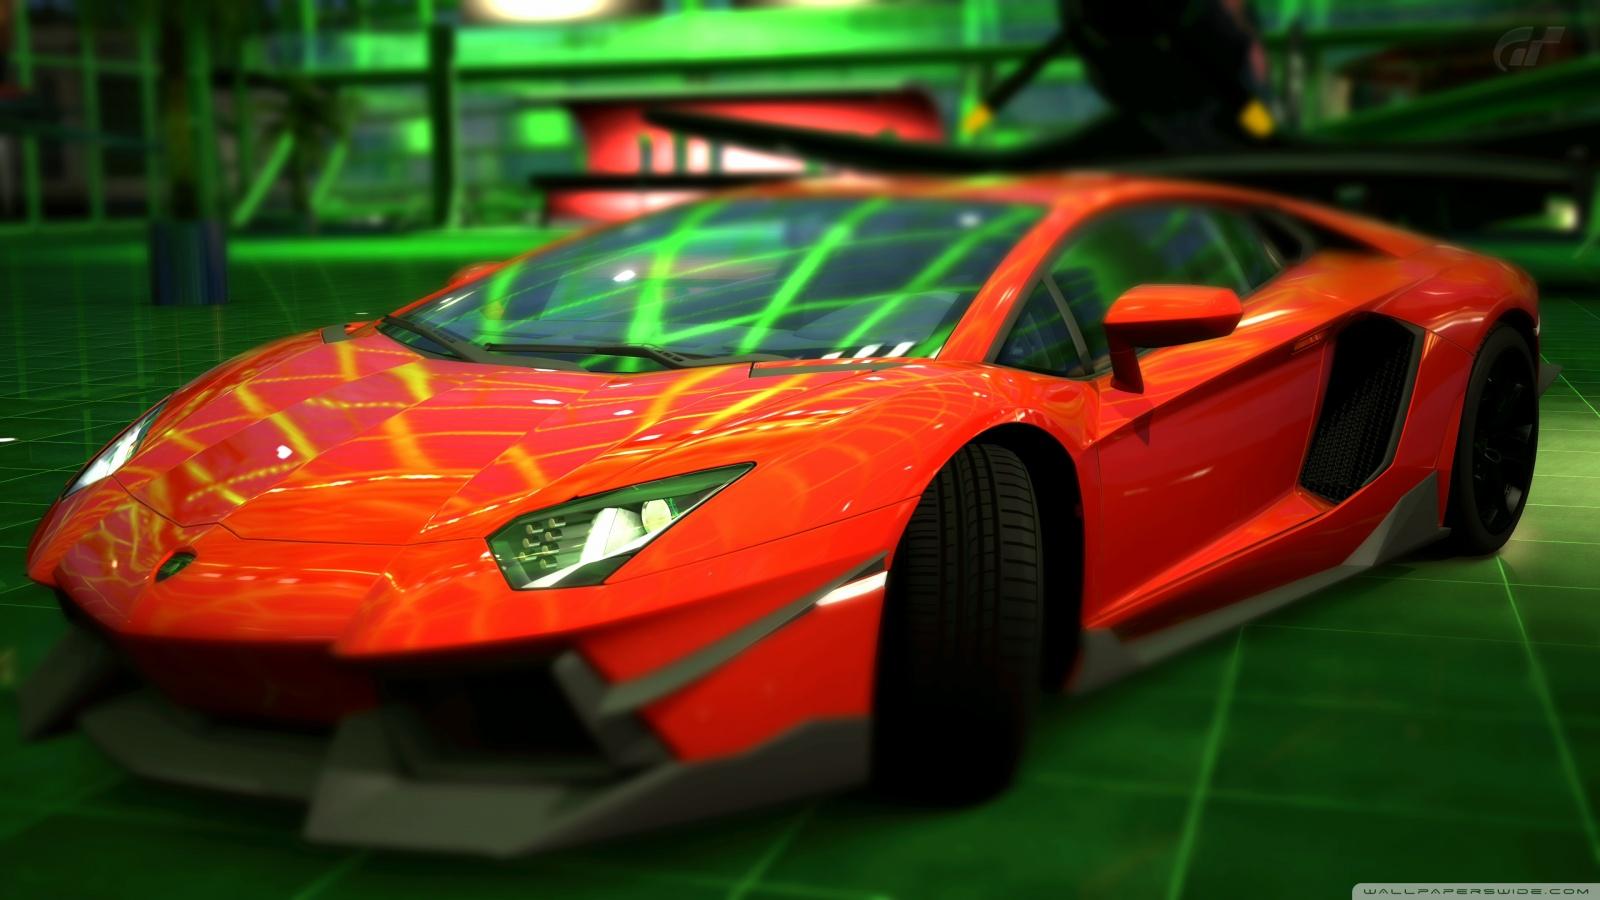 Diablo Wallpaper Hd Lamborghini Aventador Lp700 4 Red 4k Hd Desktop Wallpaper